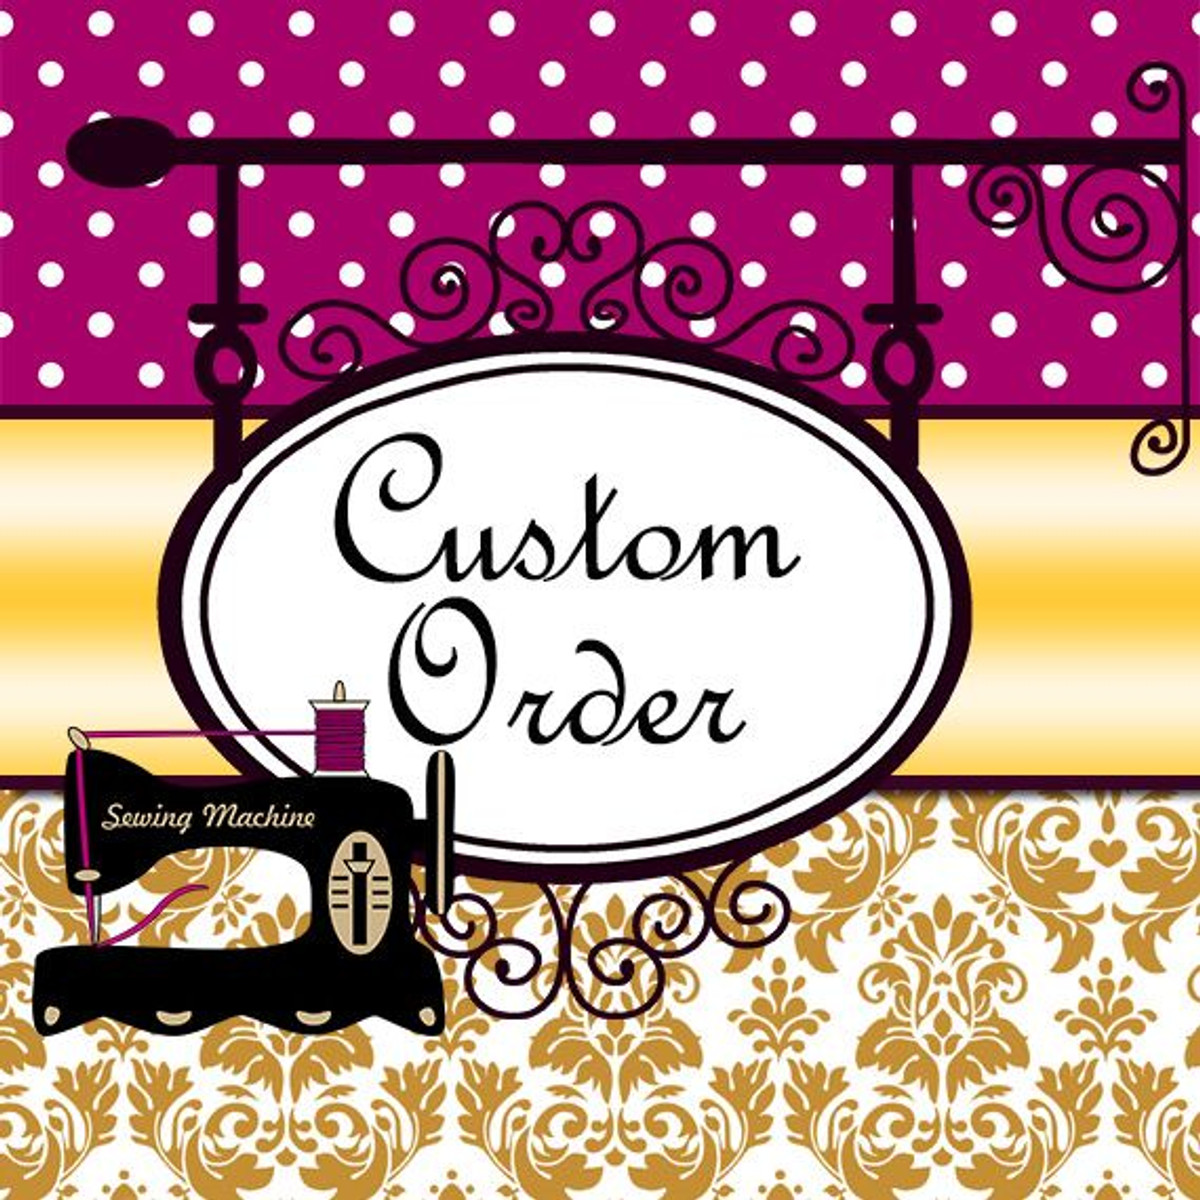 Custom Wedding Dress for Peyton